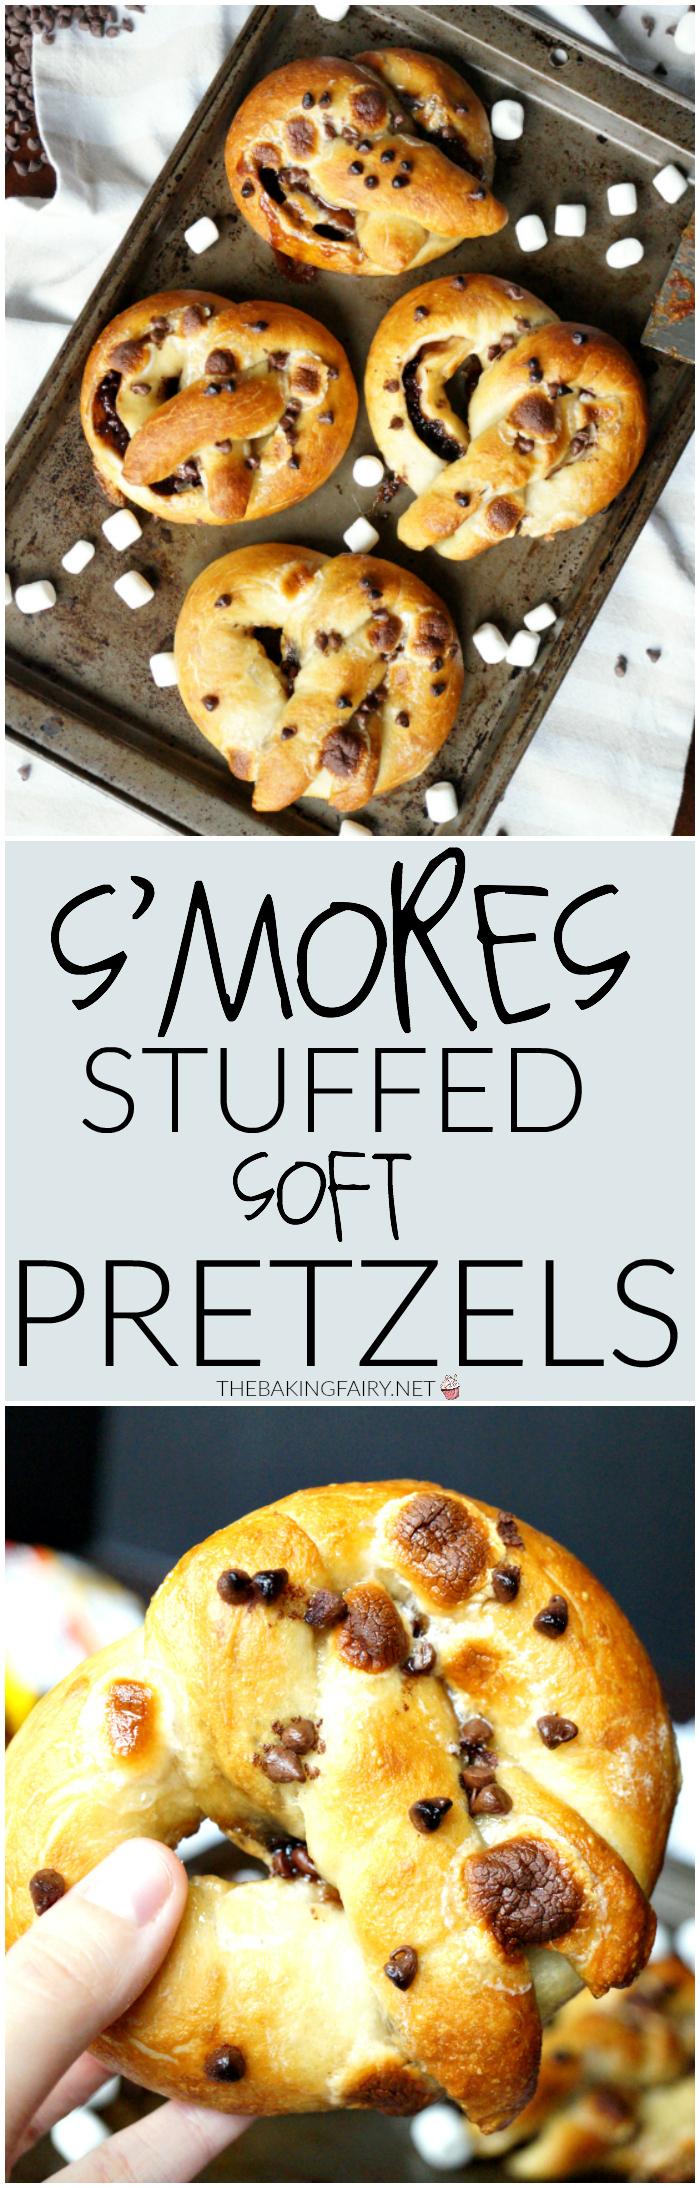 s'mores stuffed pretzels   The Baking Fairy